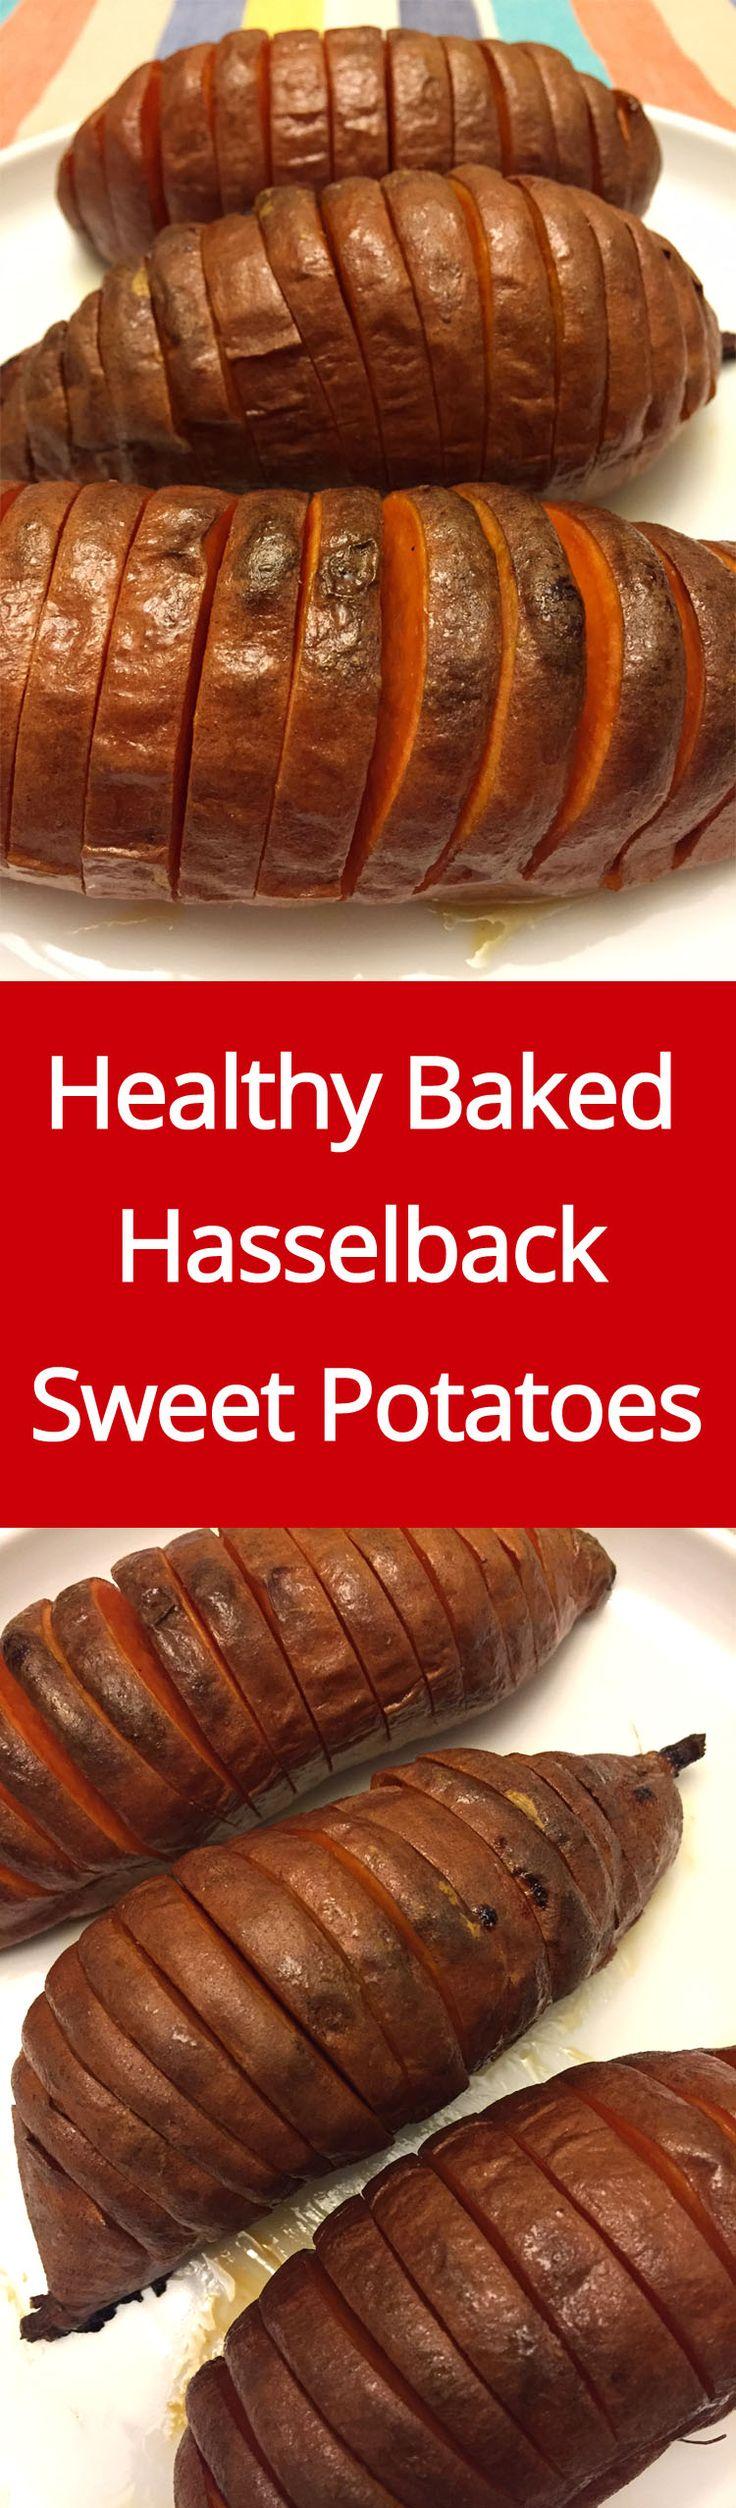 Hasselback (Accordion) Baked Sweet Potatoes Recipe (Paleo)